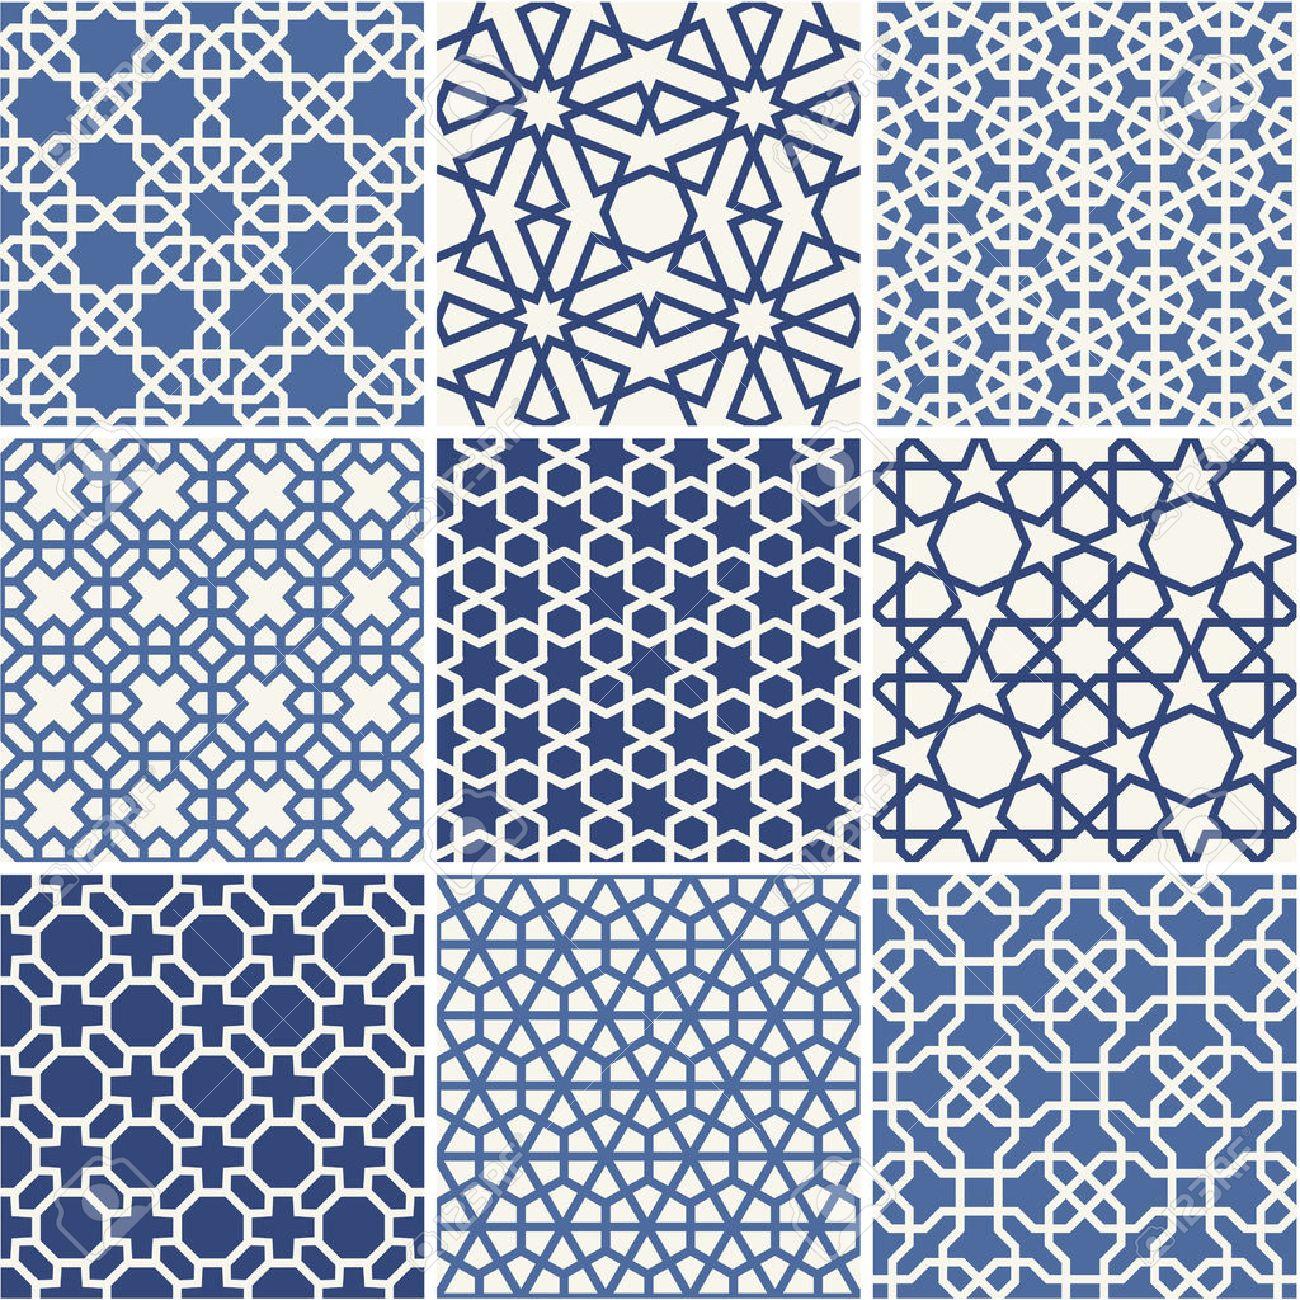 Set of Arabic seamless patterns, vector - 36623779